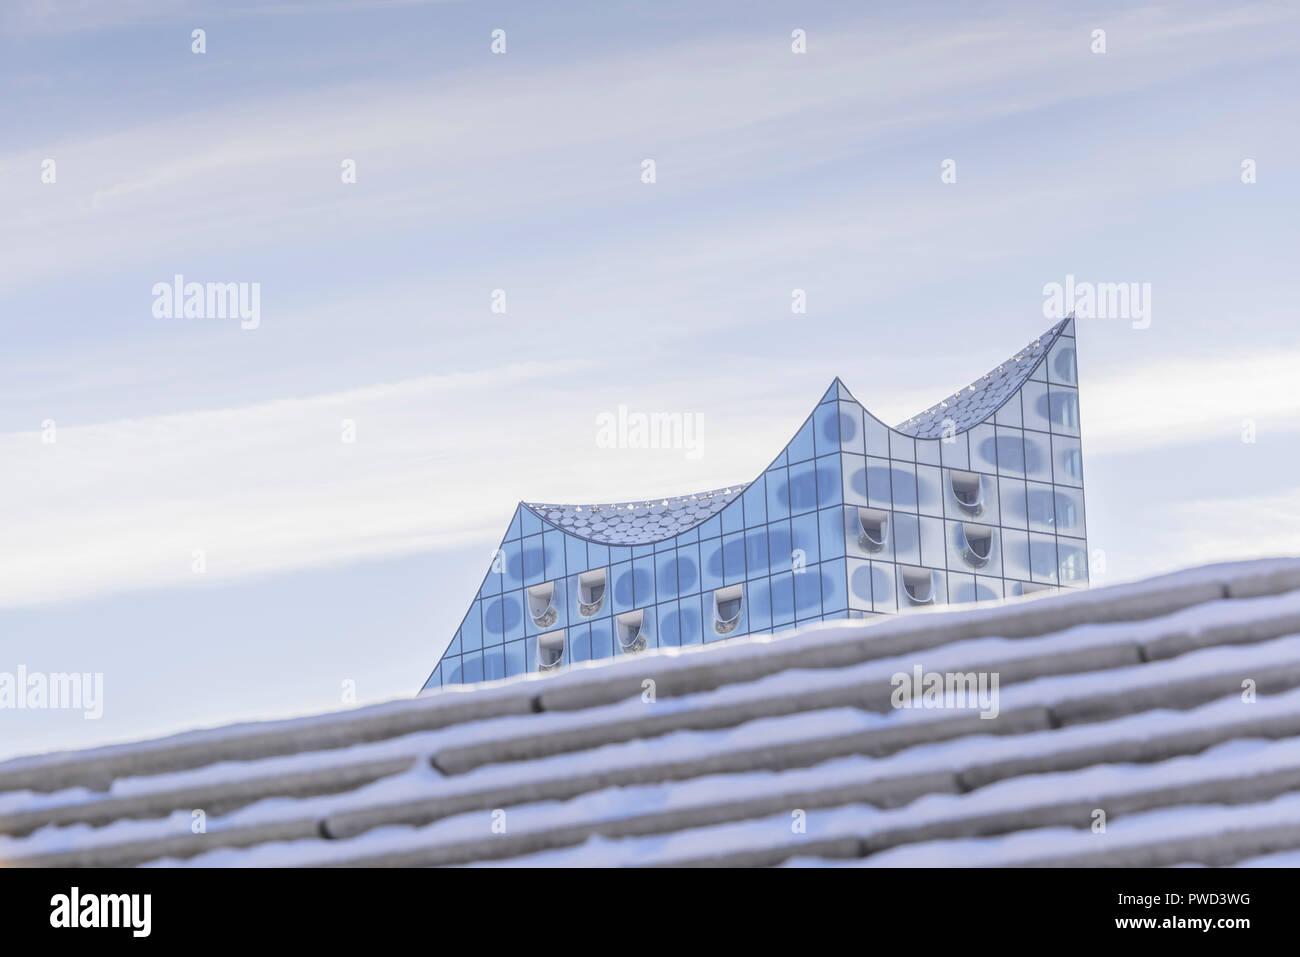 Deutschland, Hamburg, Hafen, Hafencity, Elbphilharmonie, Hafenpromenade, Promenade - Stock Image